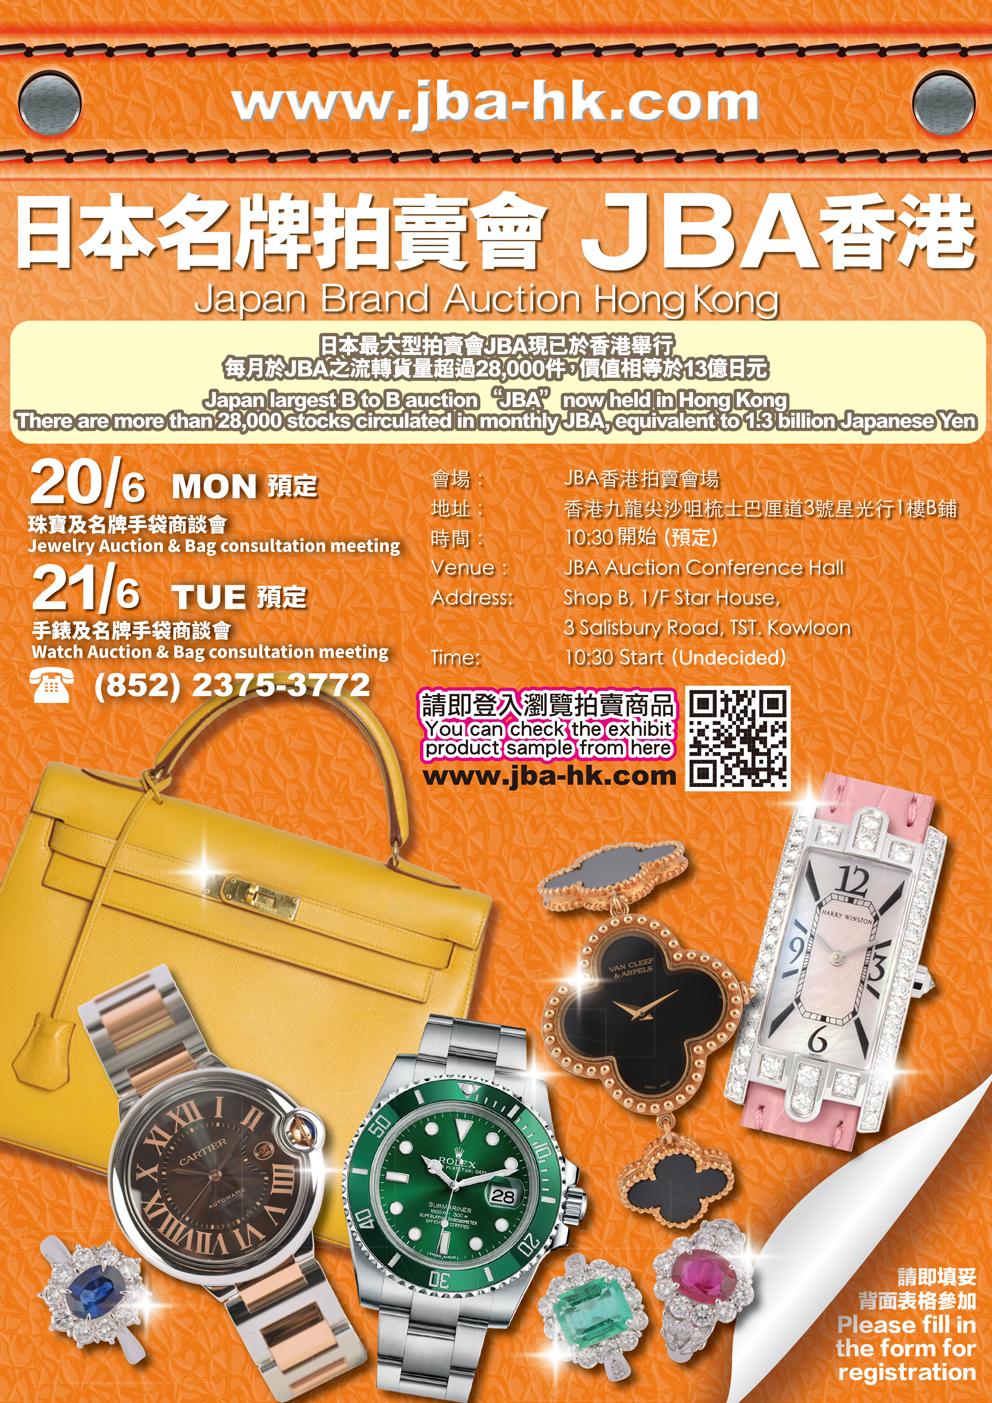 JBA tra front 复制